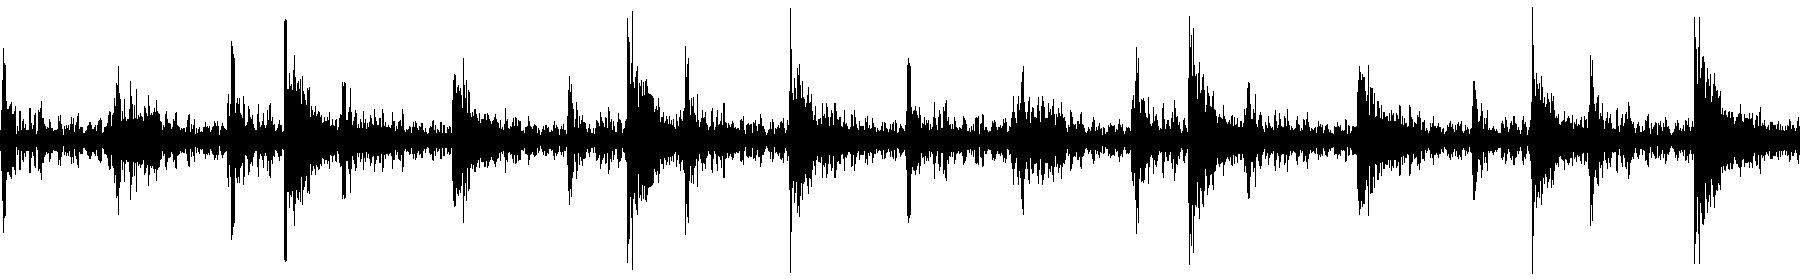 blbc jazzydrums 130 02